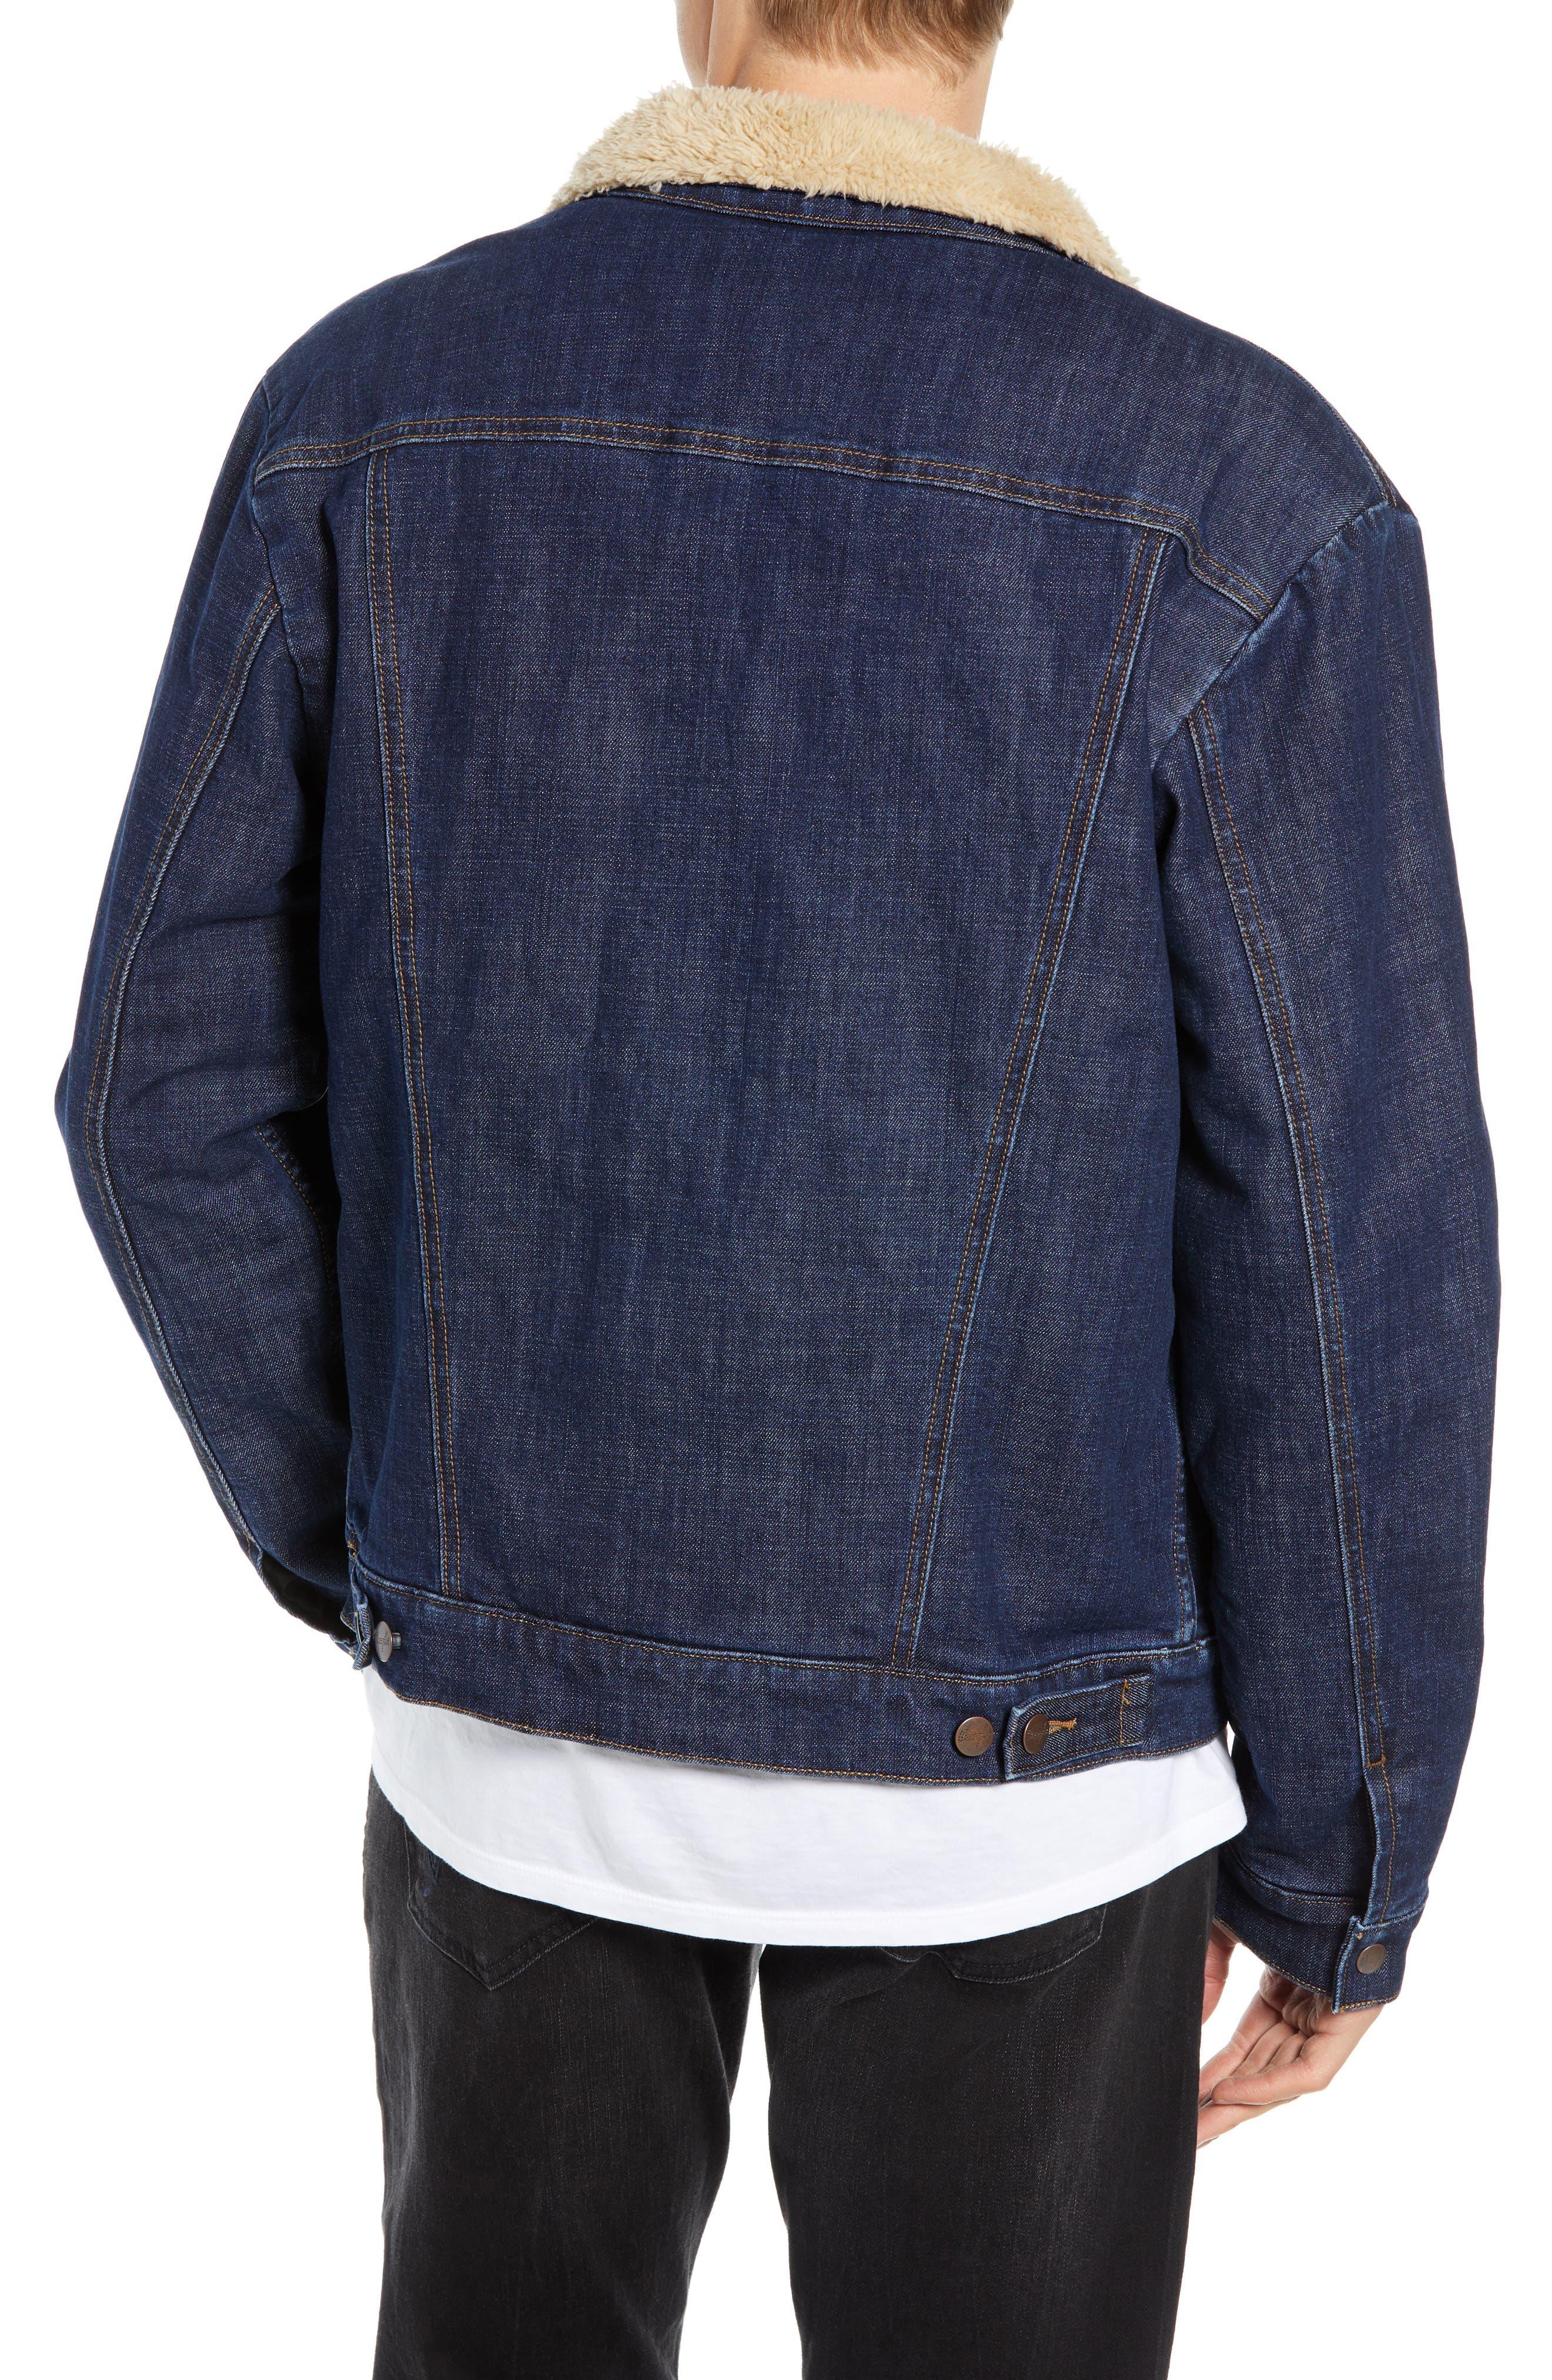 Heritage Fleece Lined Denim Jacket,                             Alternate thumbnail 2, color,                             DARK